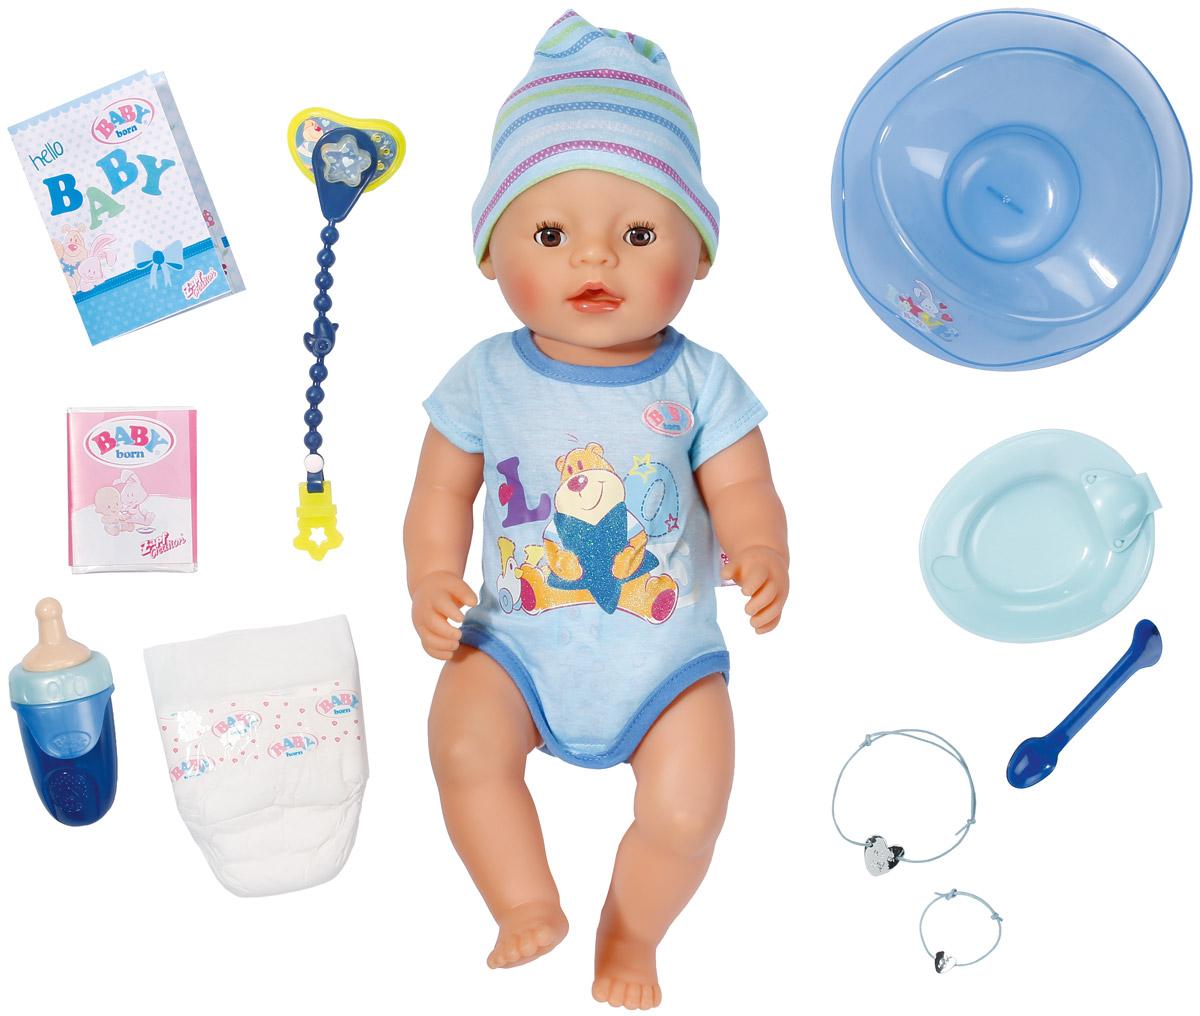 Baby Born Пупс цвет одежды серый голубой, ZAPF Creation